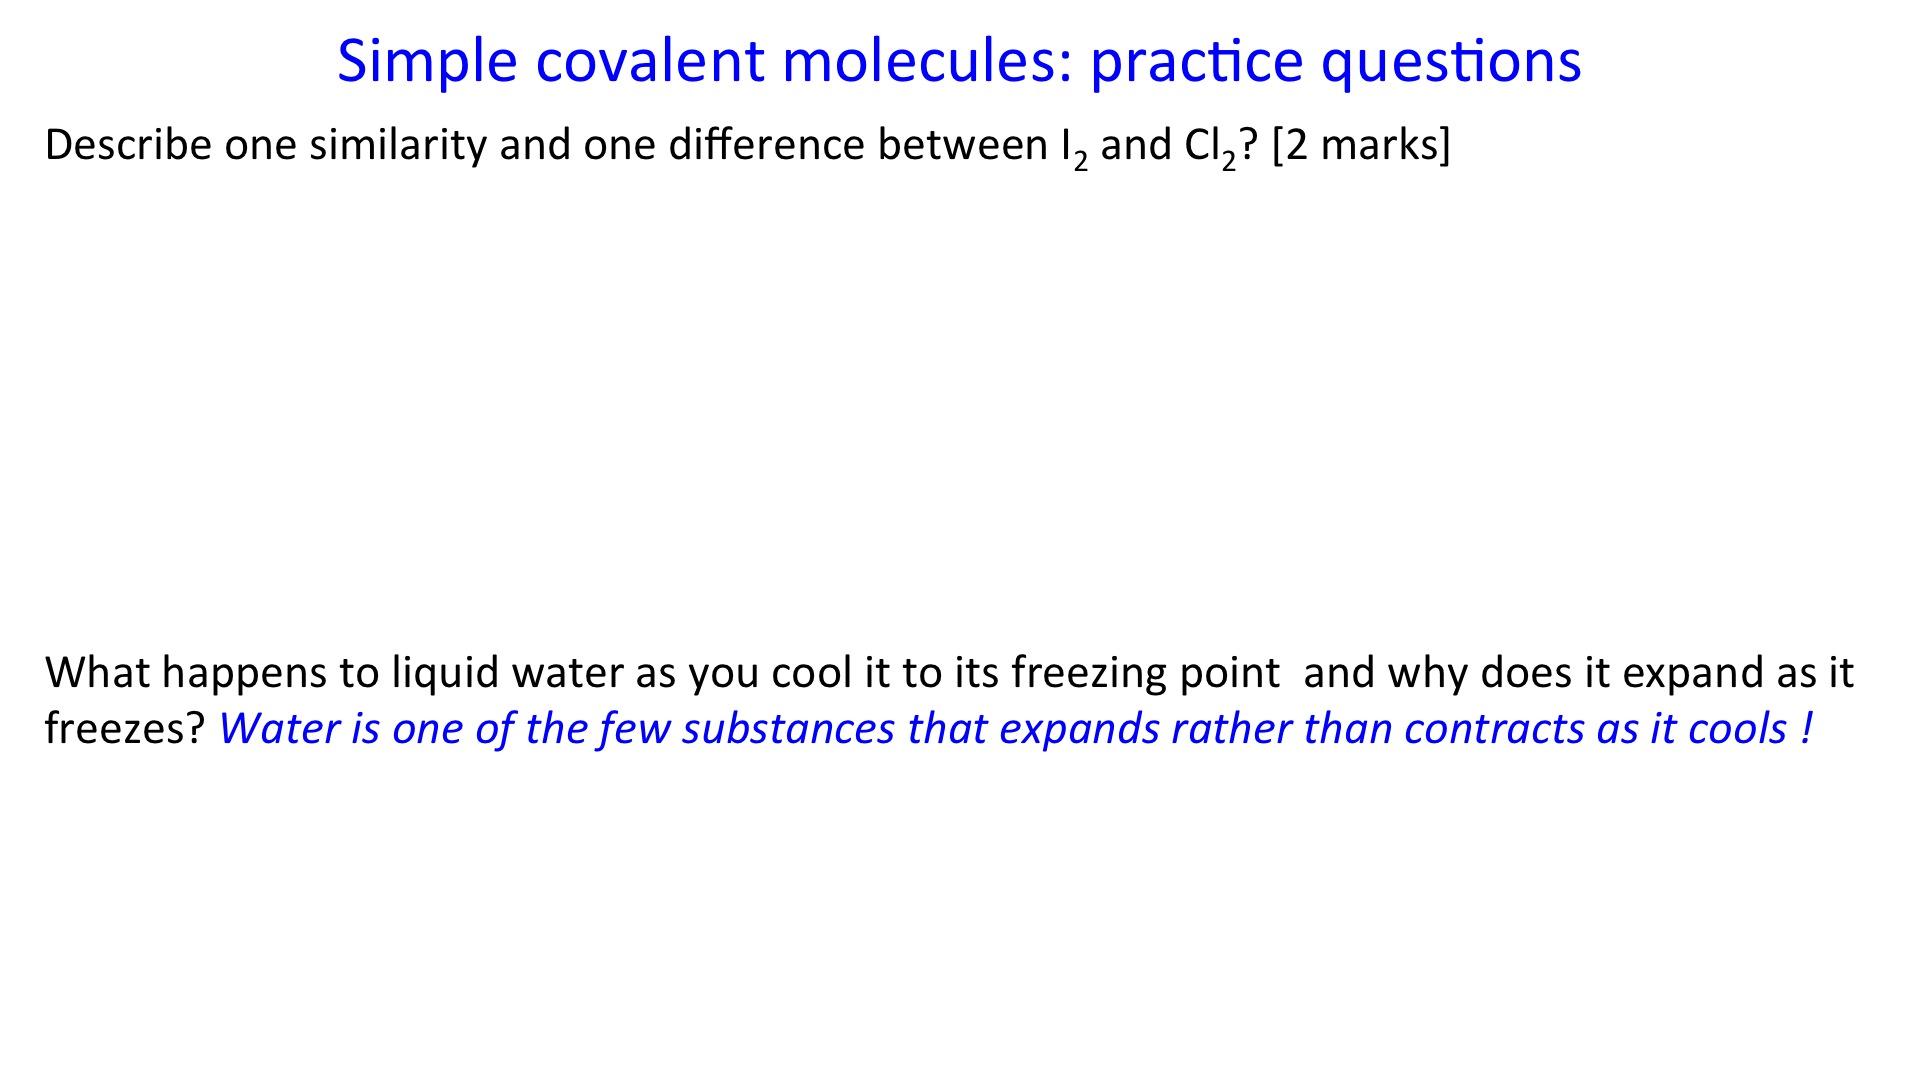 Simple Covalent Molecules